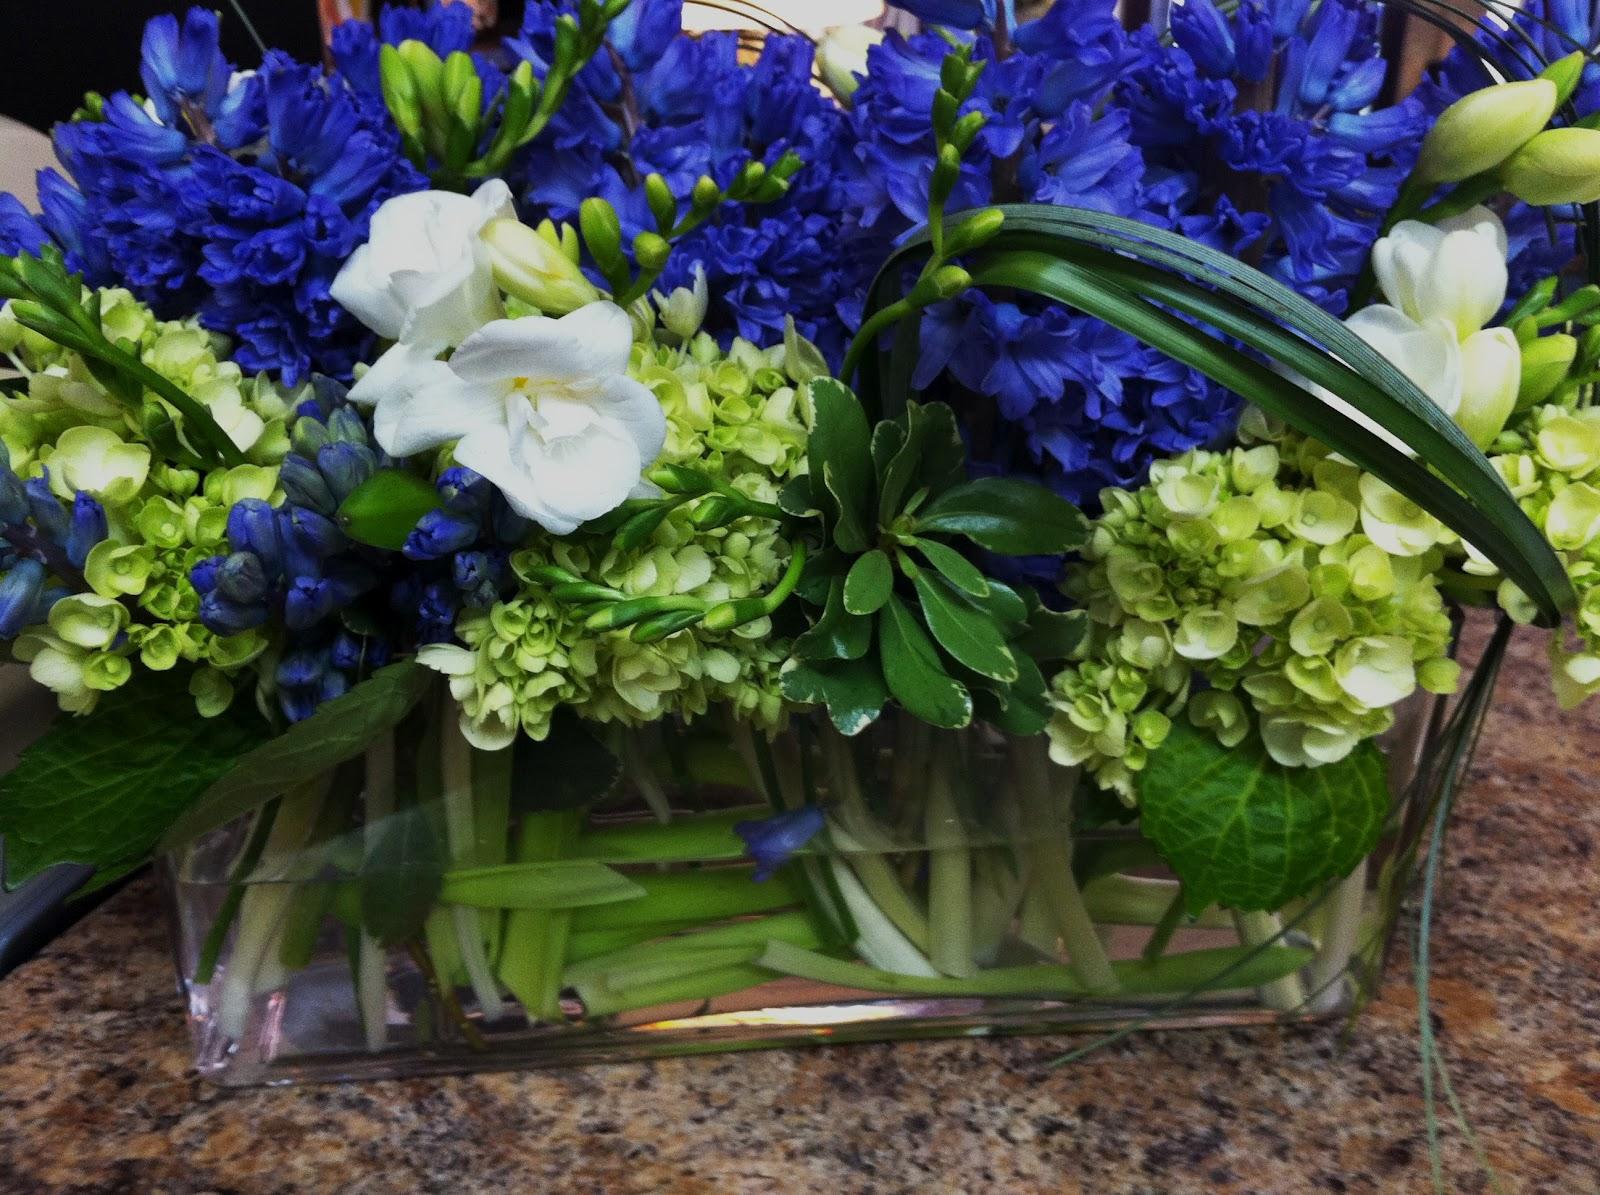 Boutique florale gigi lachine florist blue hyacinths green hydrangeas white freesias 75 mightylinksfo